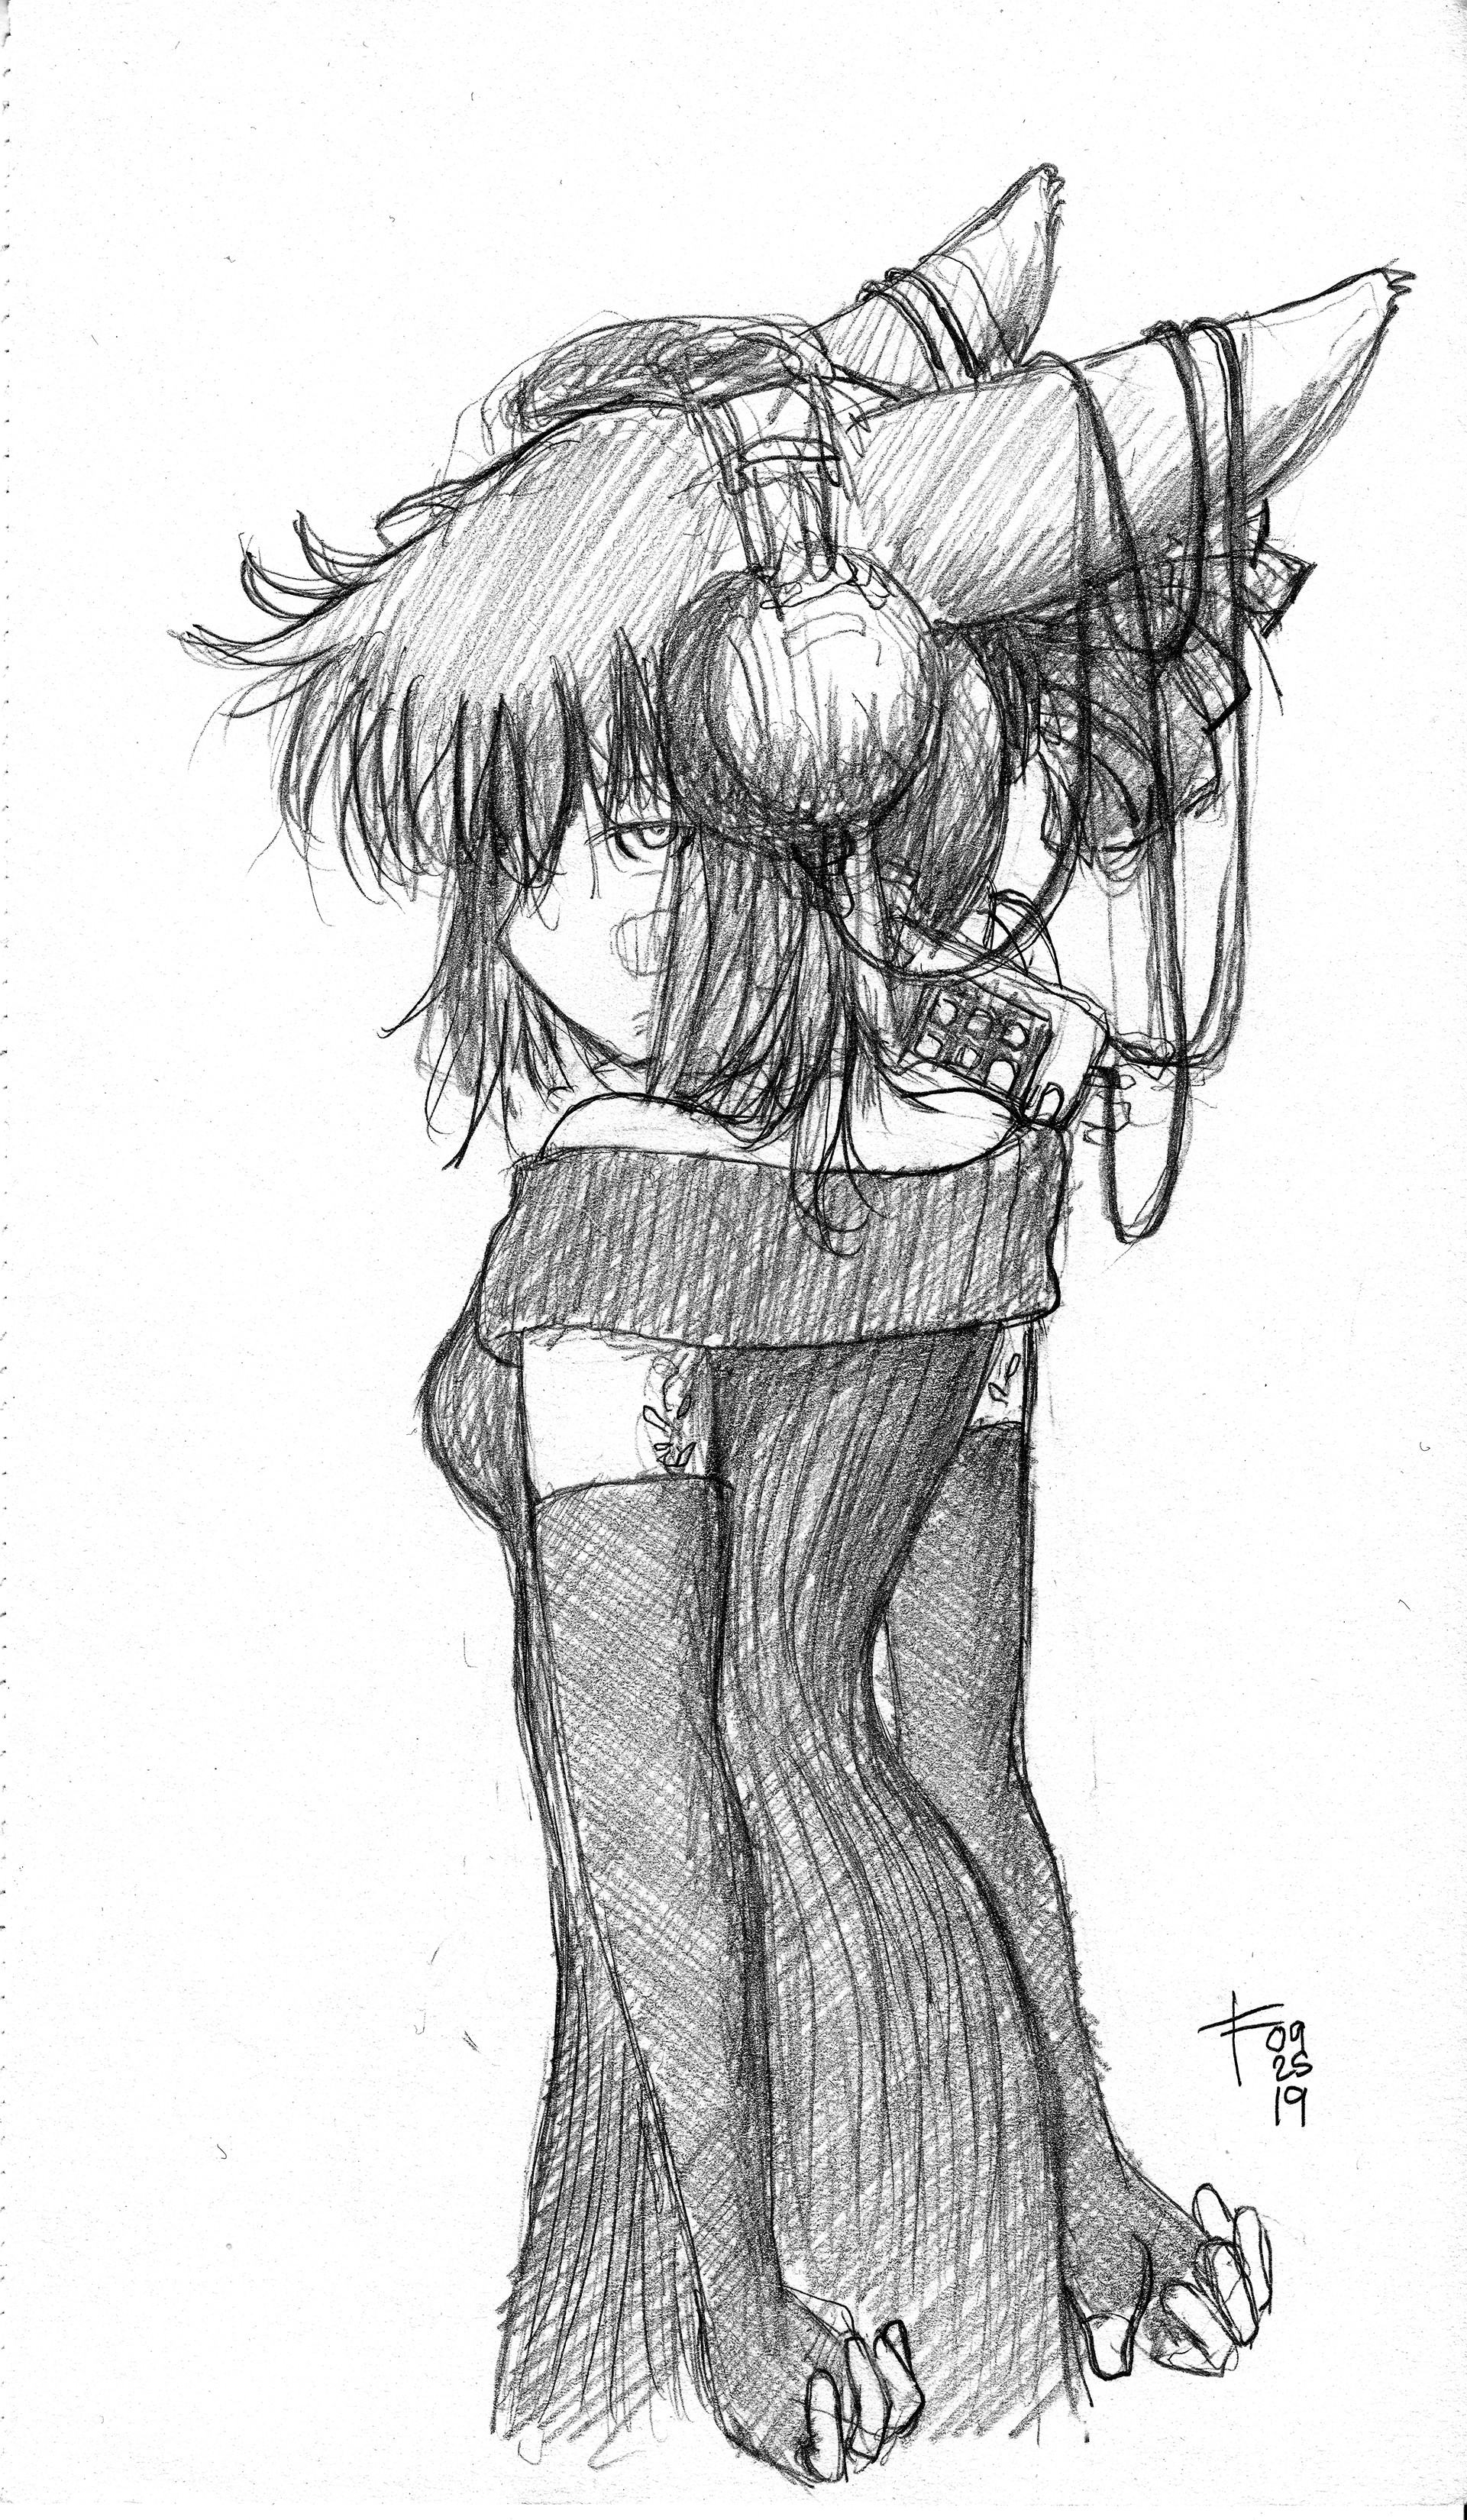 Pencil in Canson sketchbook - initial sketch